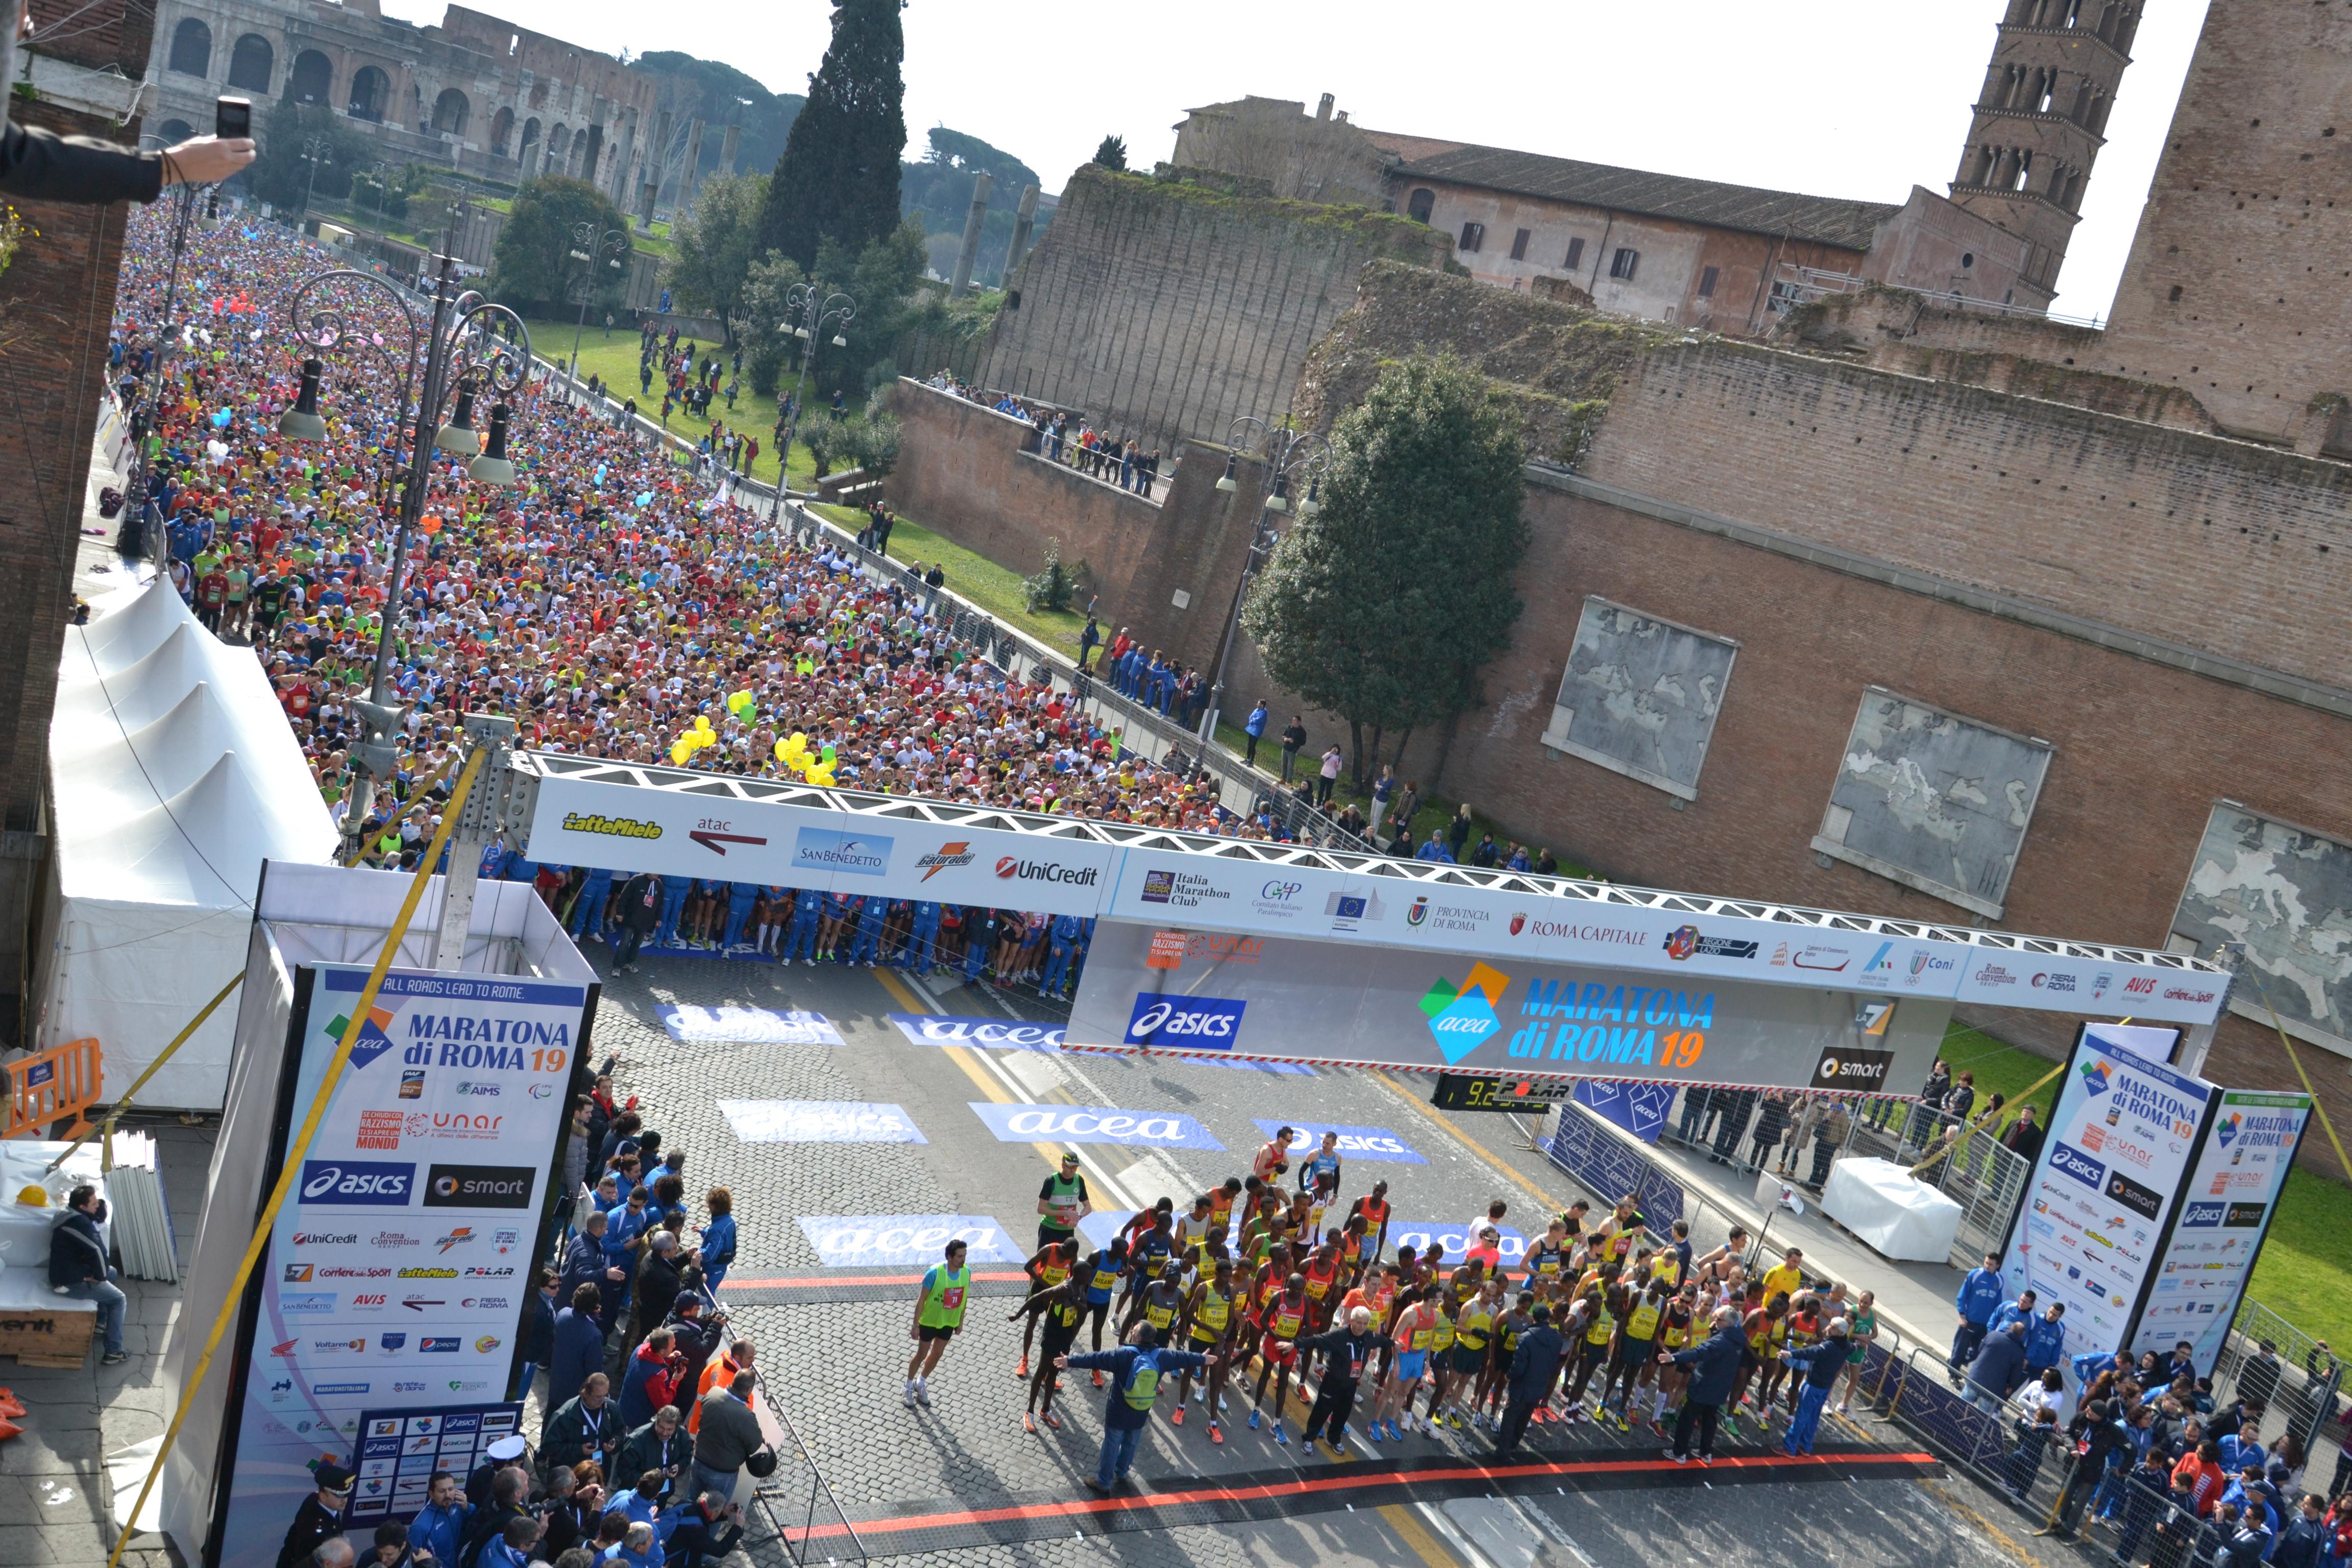 maratona-di-roma-2013-186